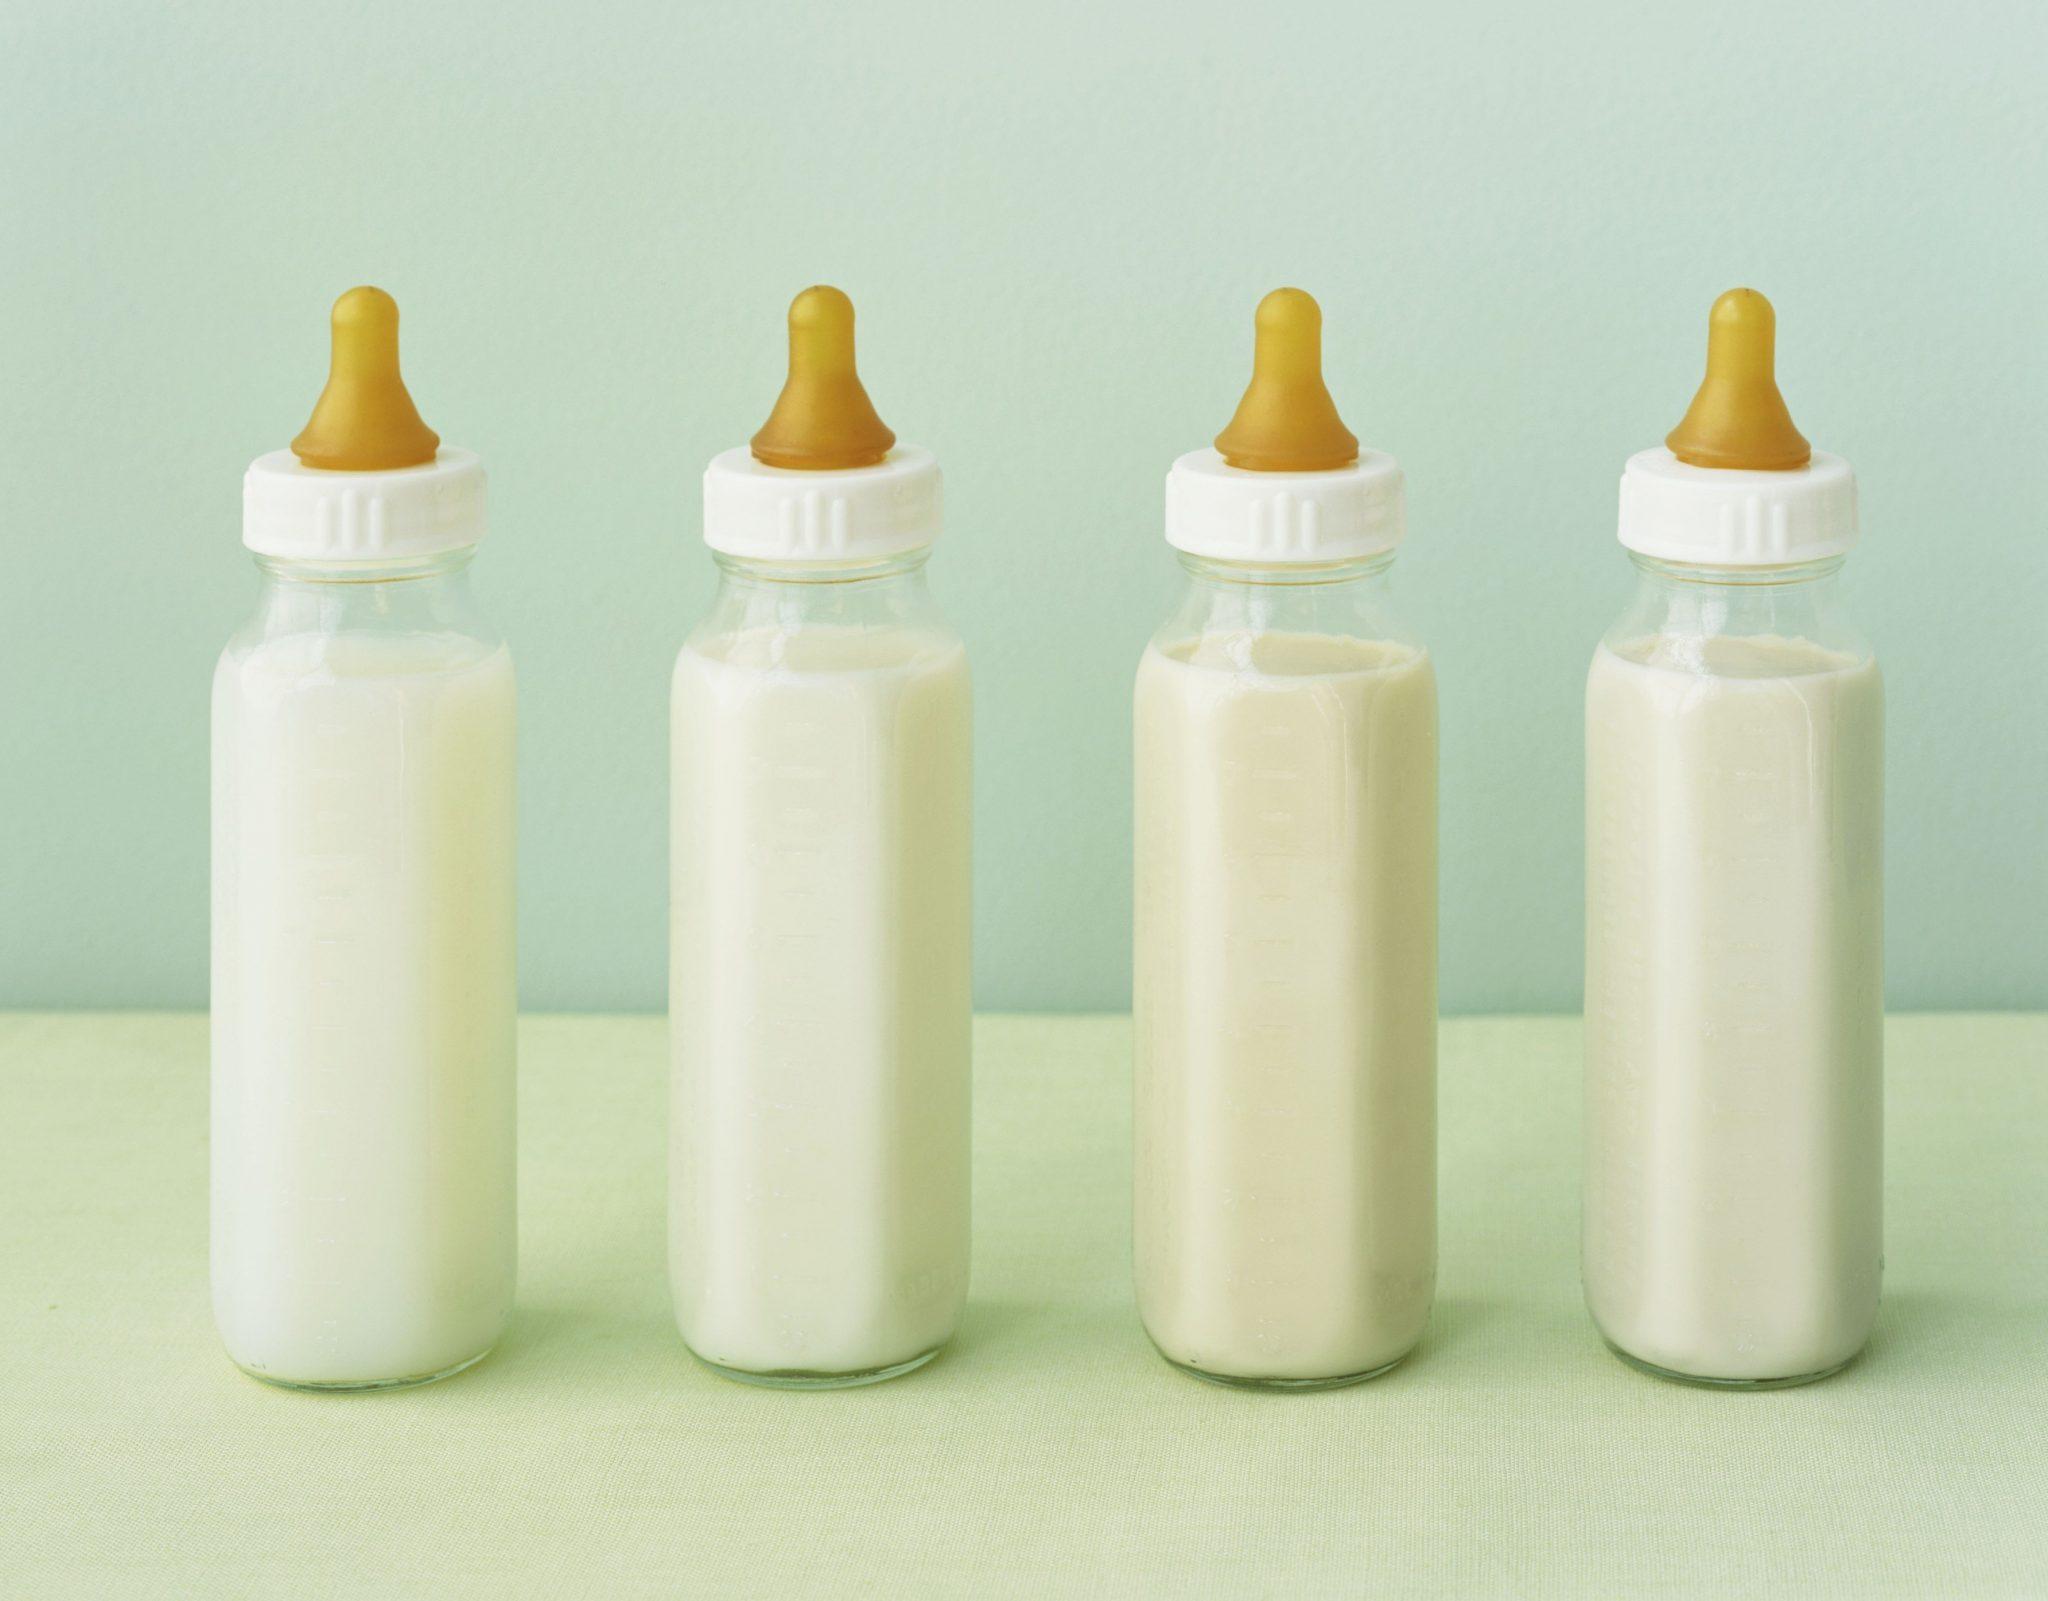 Молозиво более эффективно, чем вакцина от гриппа